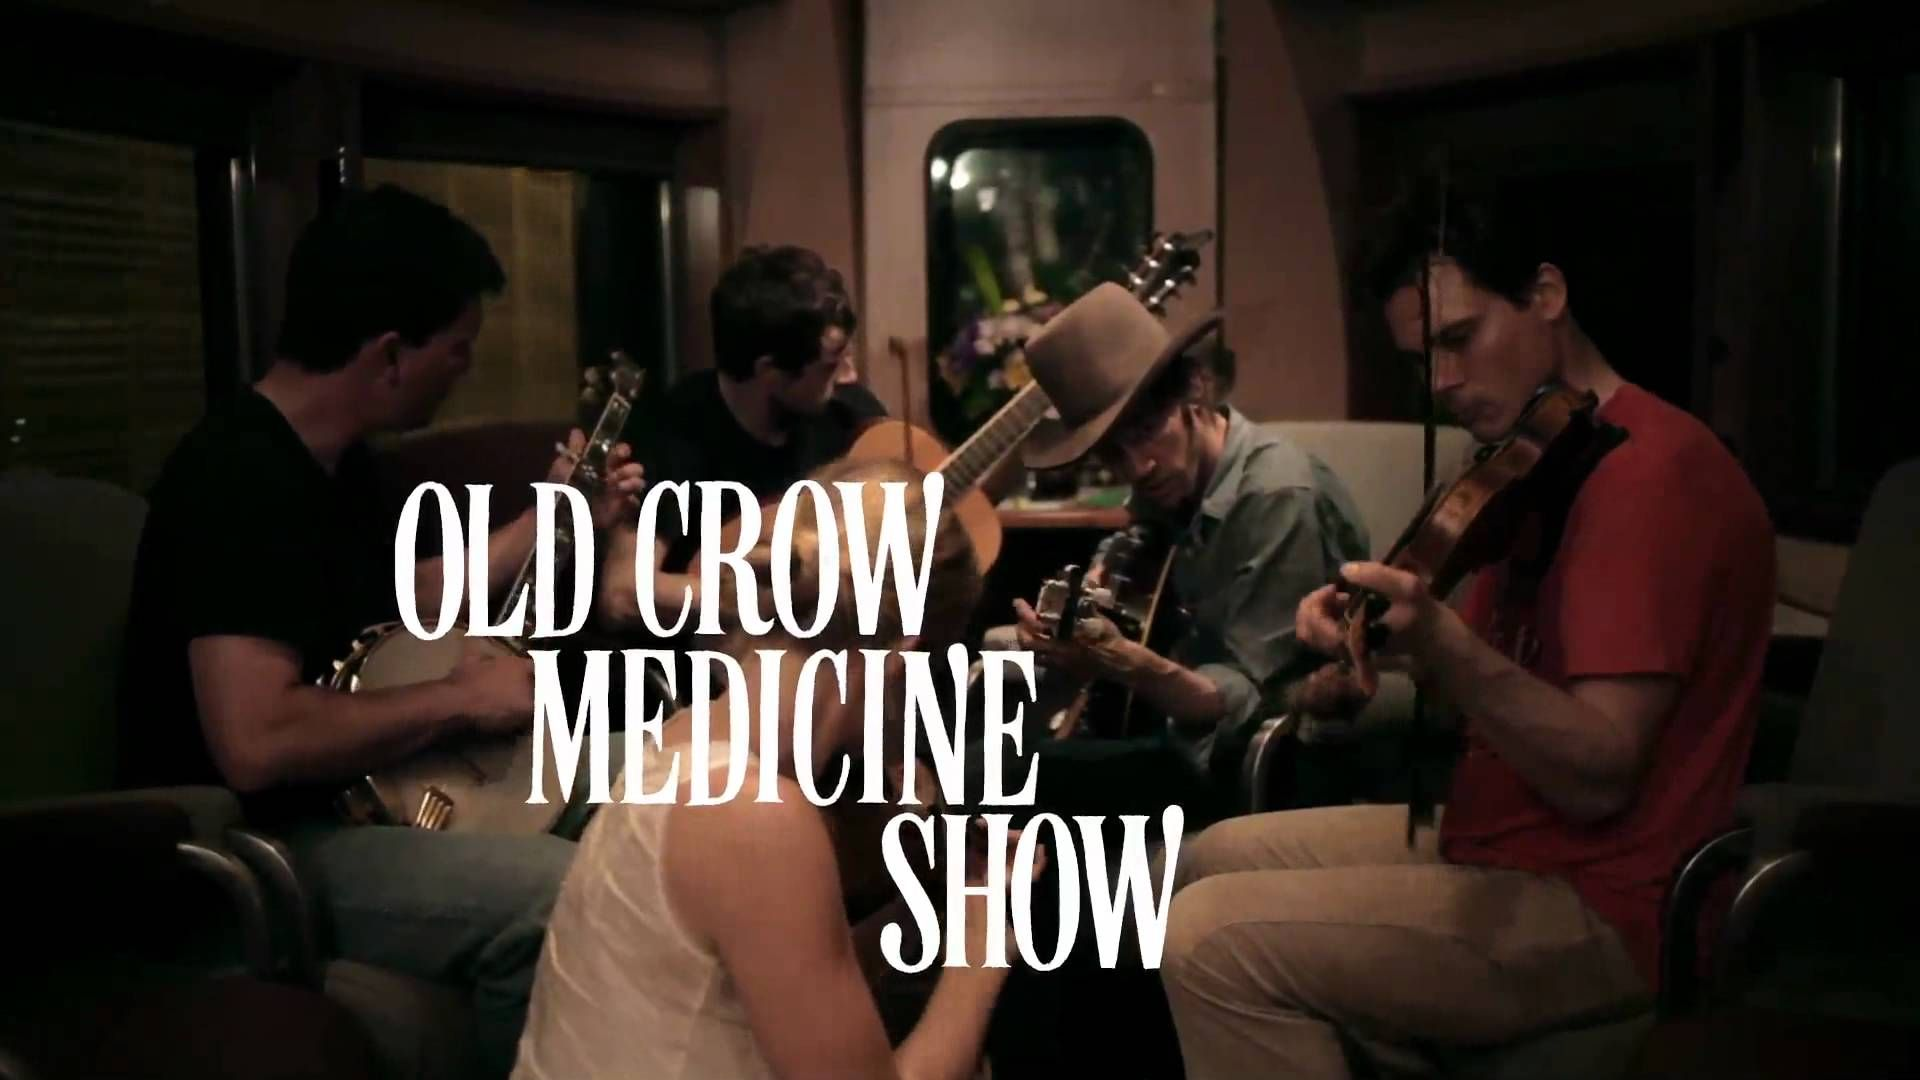 """Big Easy Express"" trailer. Old crow medicine show, Film"